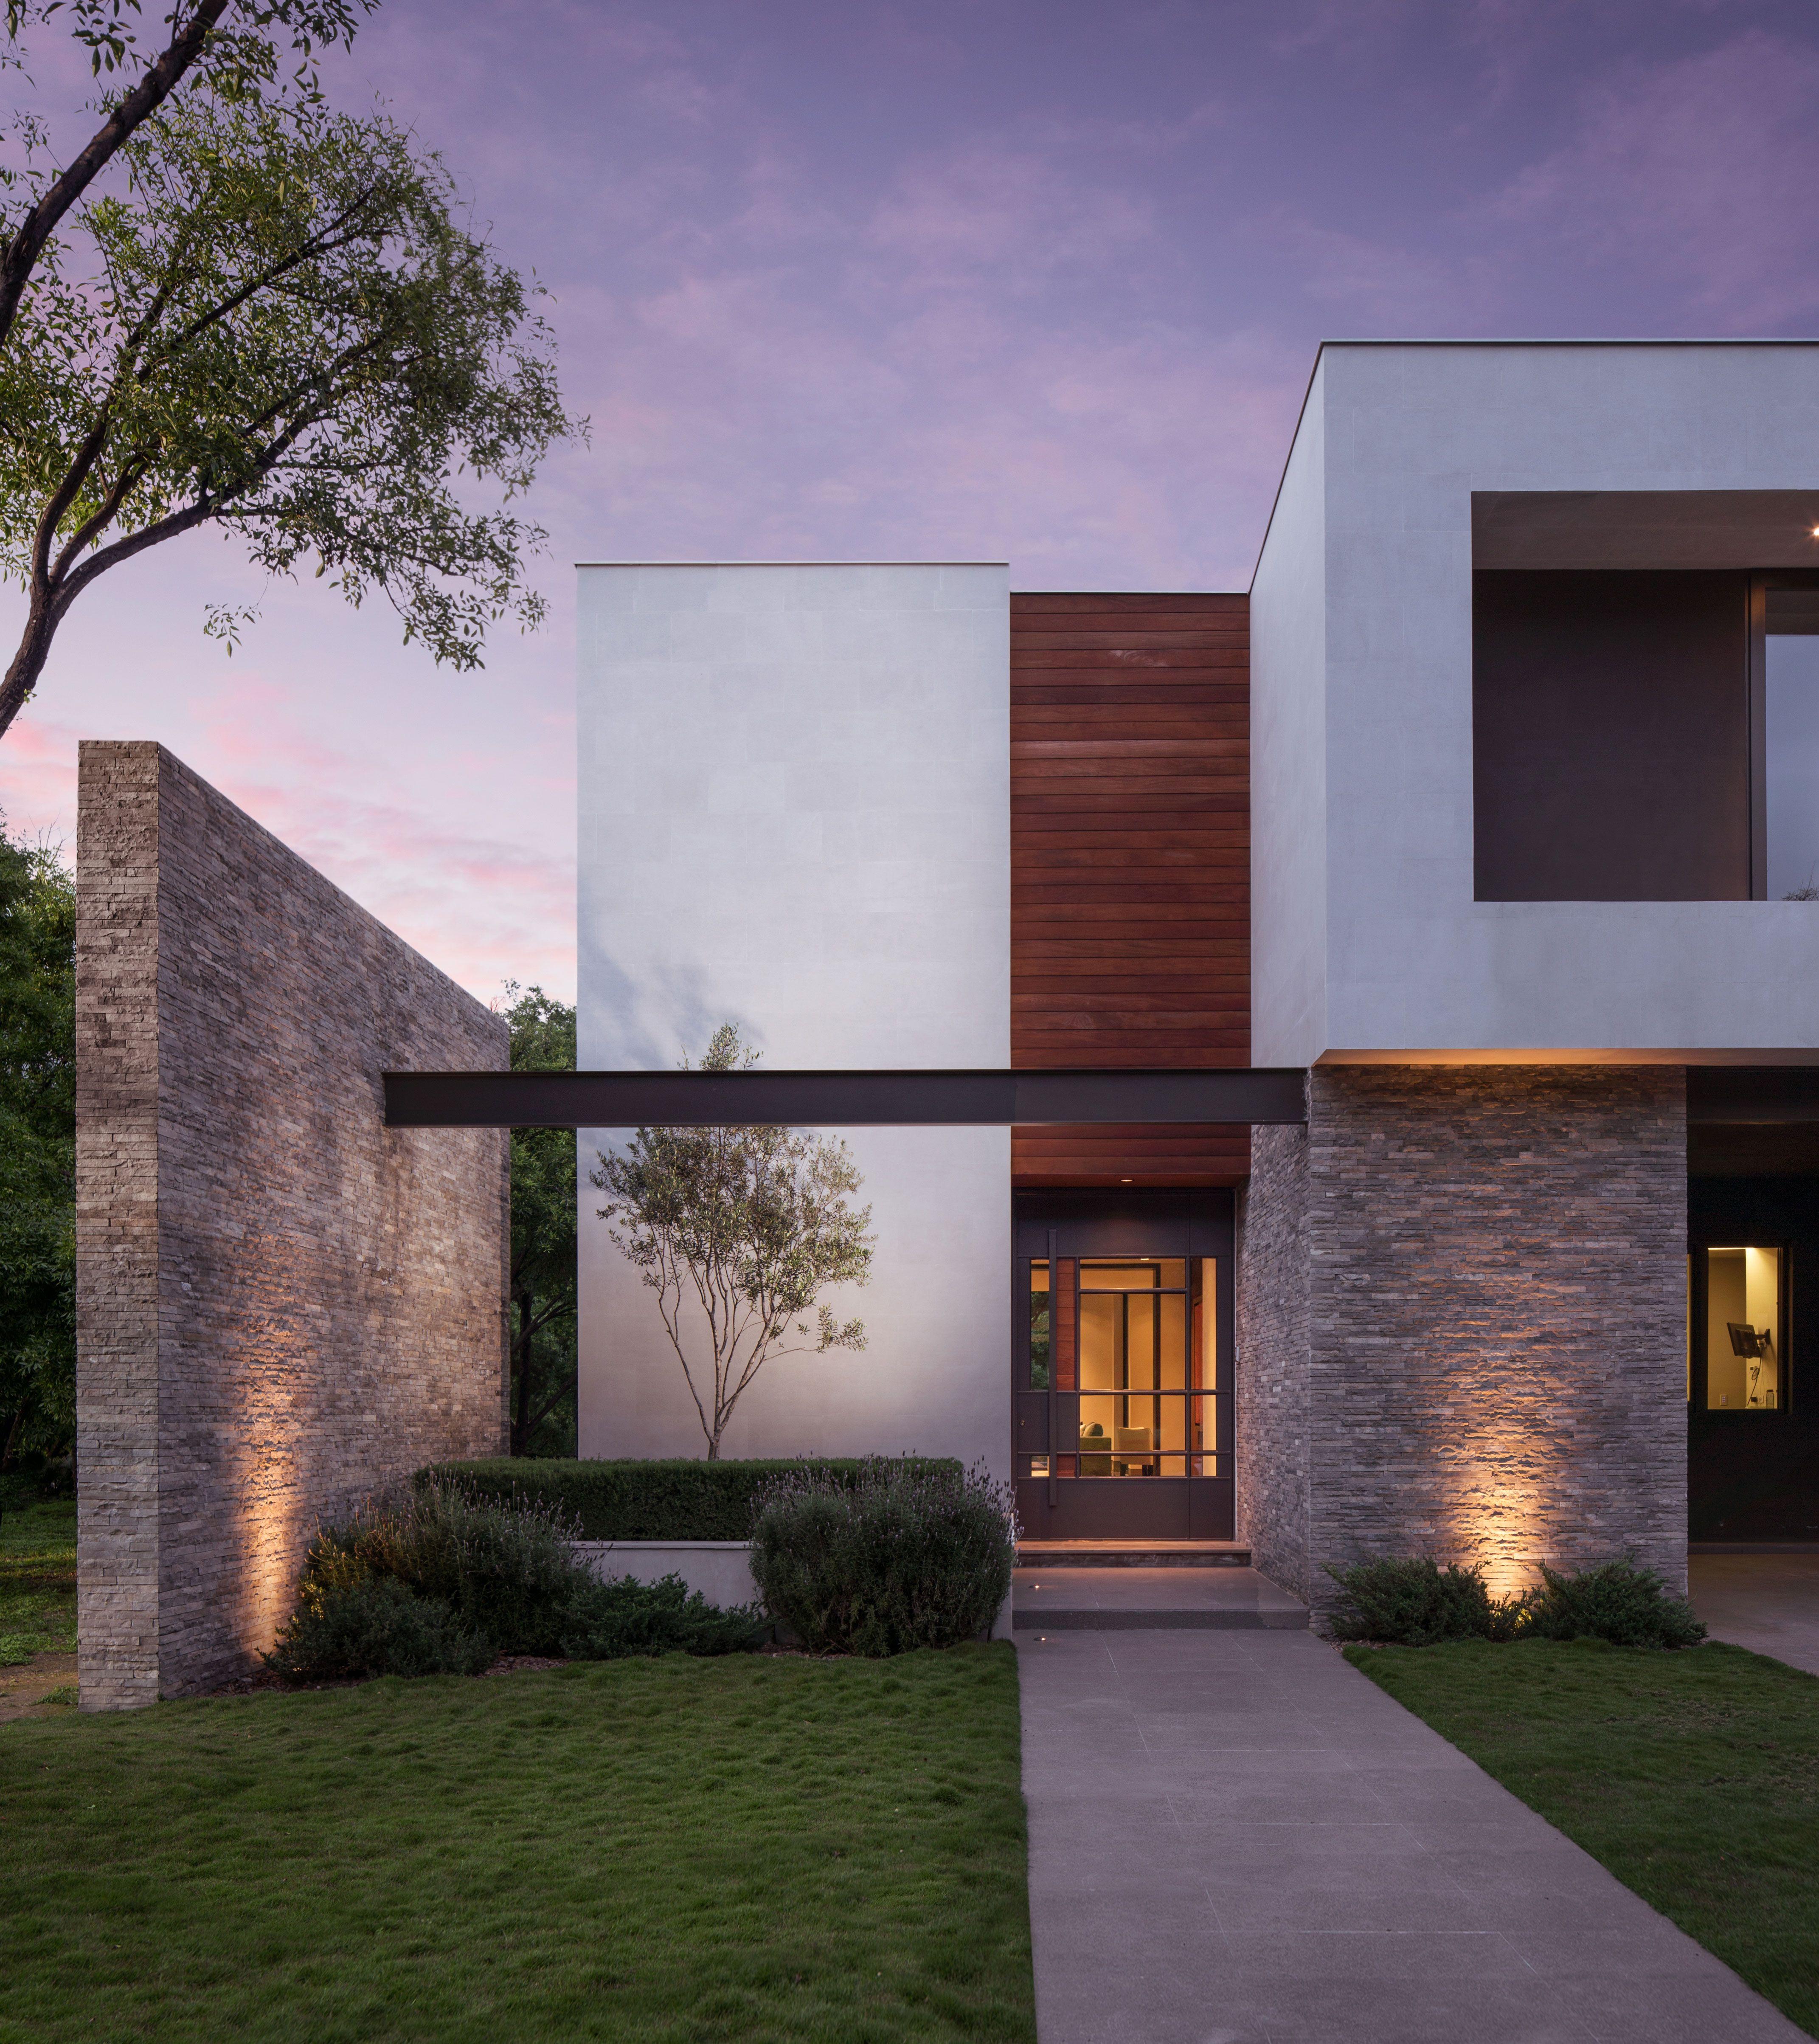 Architecture architect house pozas arquitectos for Arquitectos de la arquitectura moderna